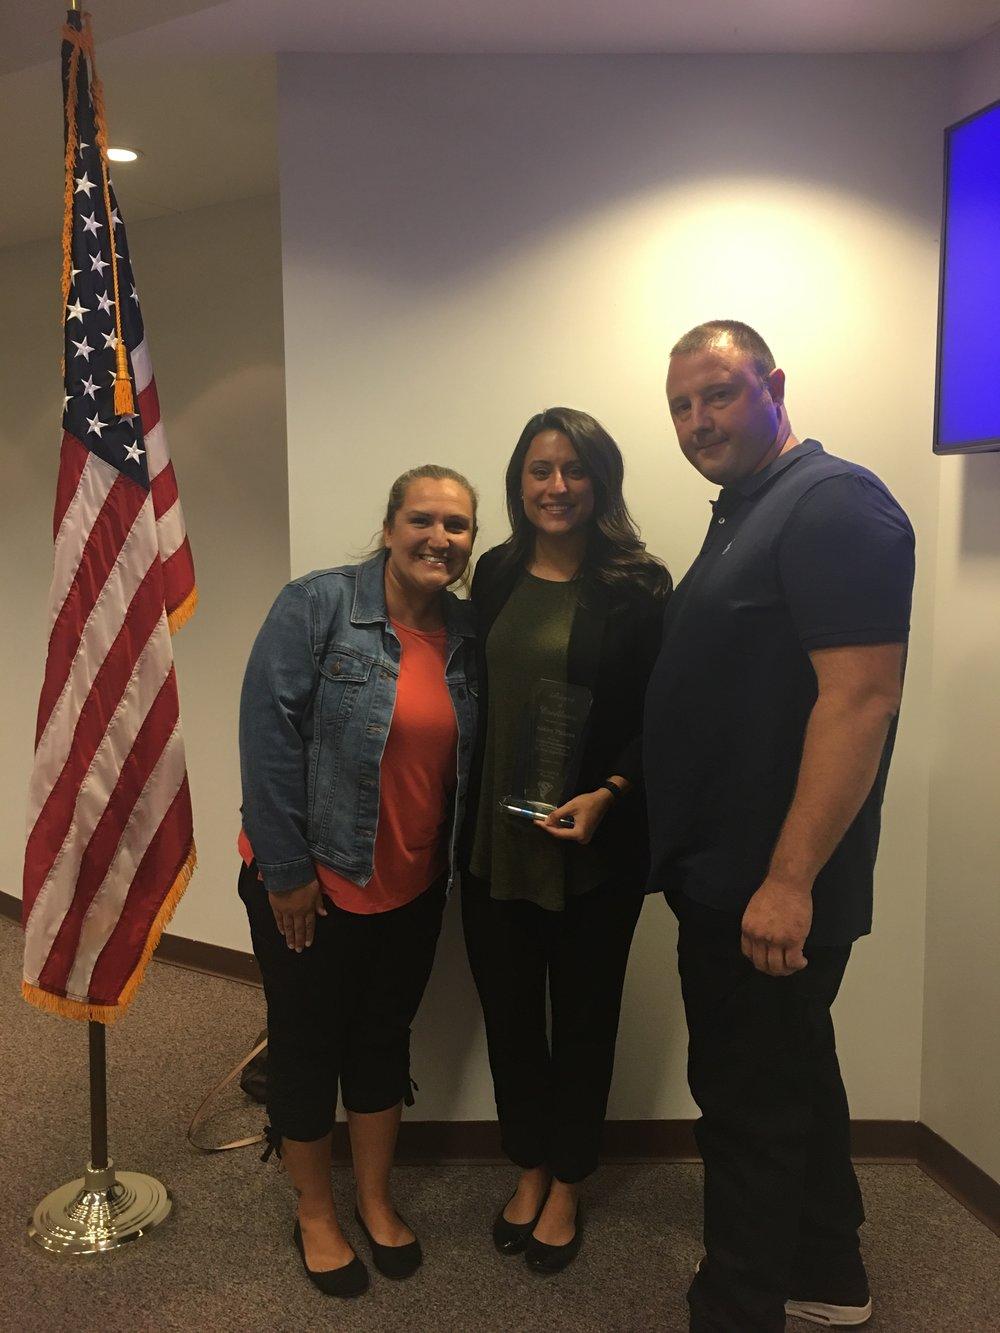 Teacher Appreciation Award    Ms. Ashley Pickens from Dr. Julian Rogus School, Summit Hill School District 161, Frankfort IL